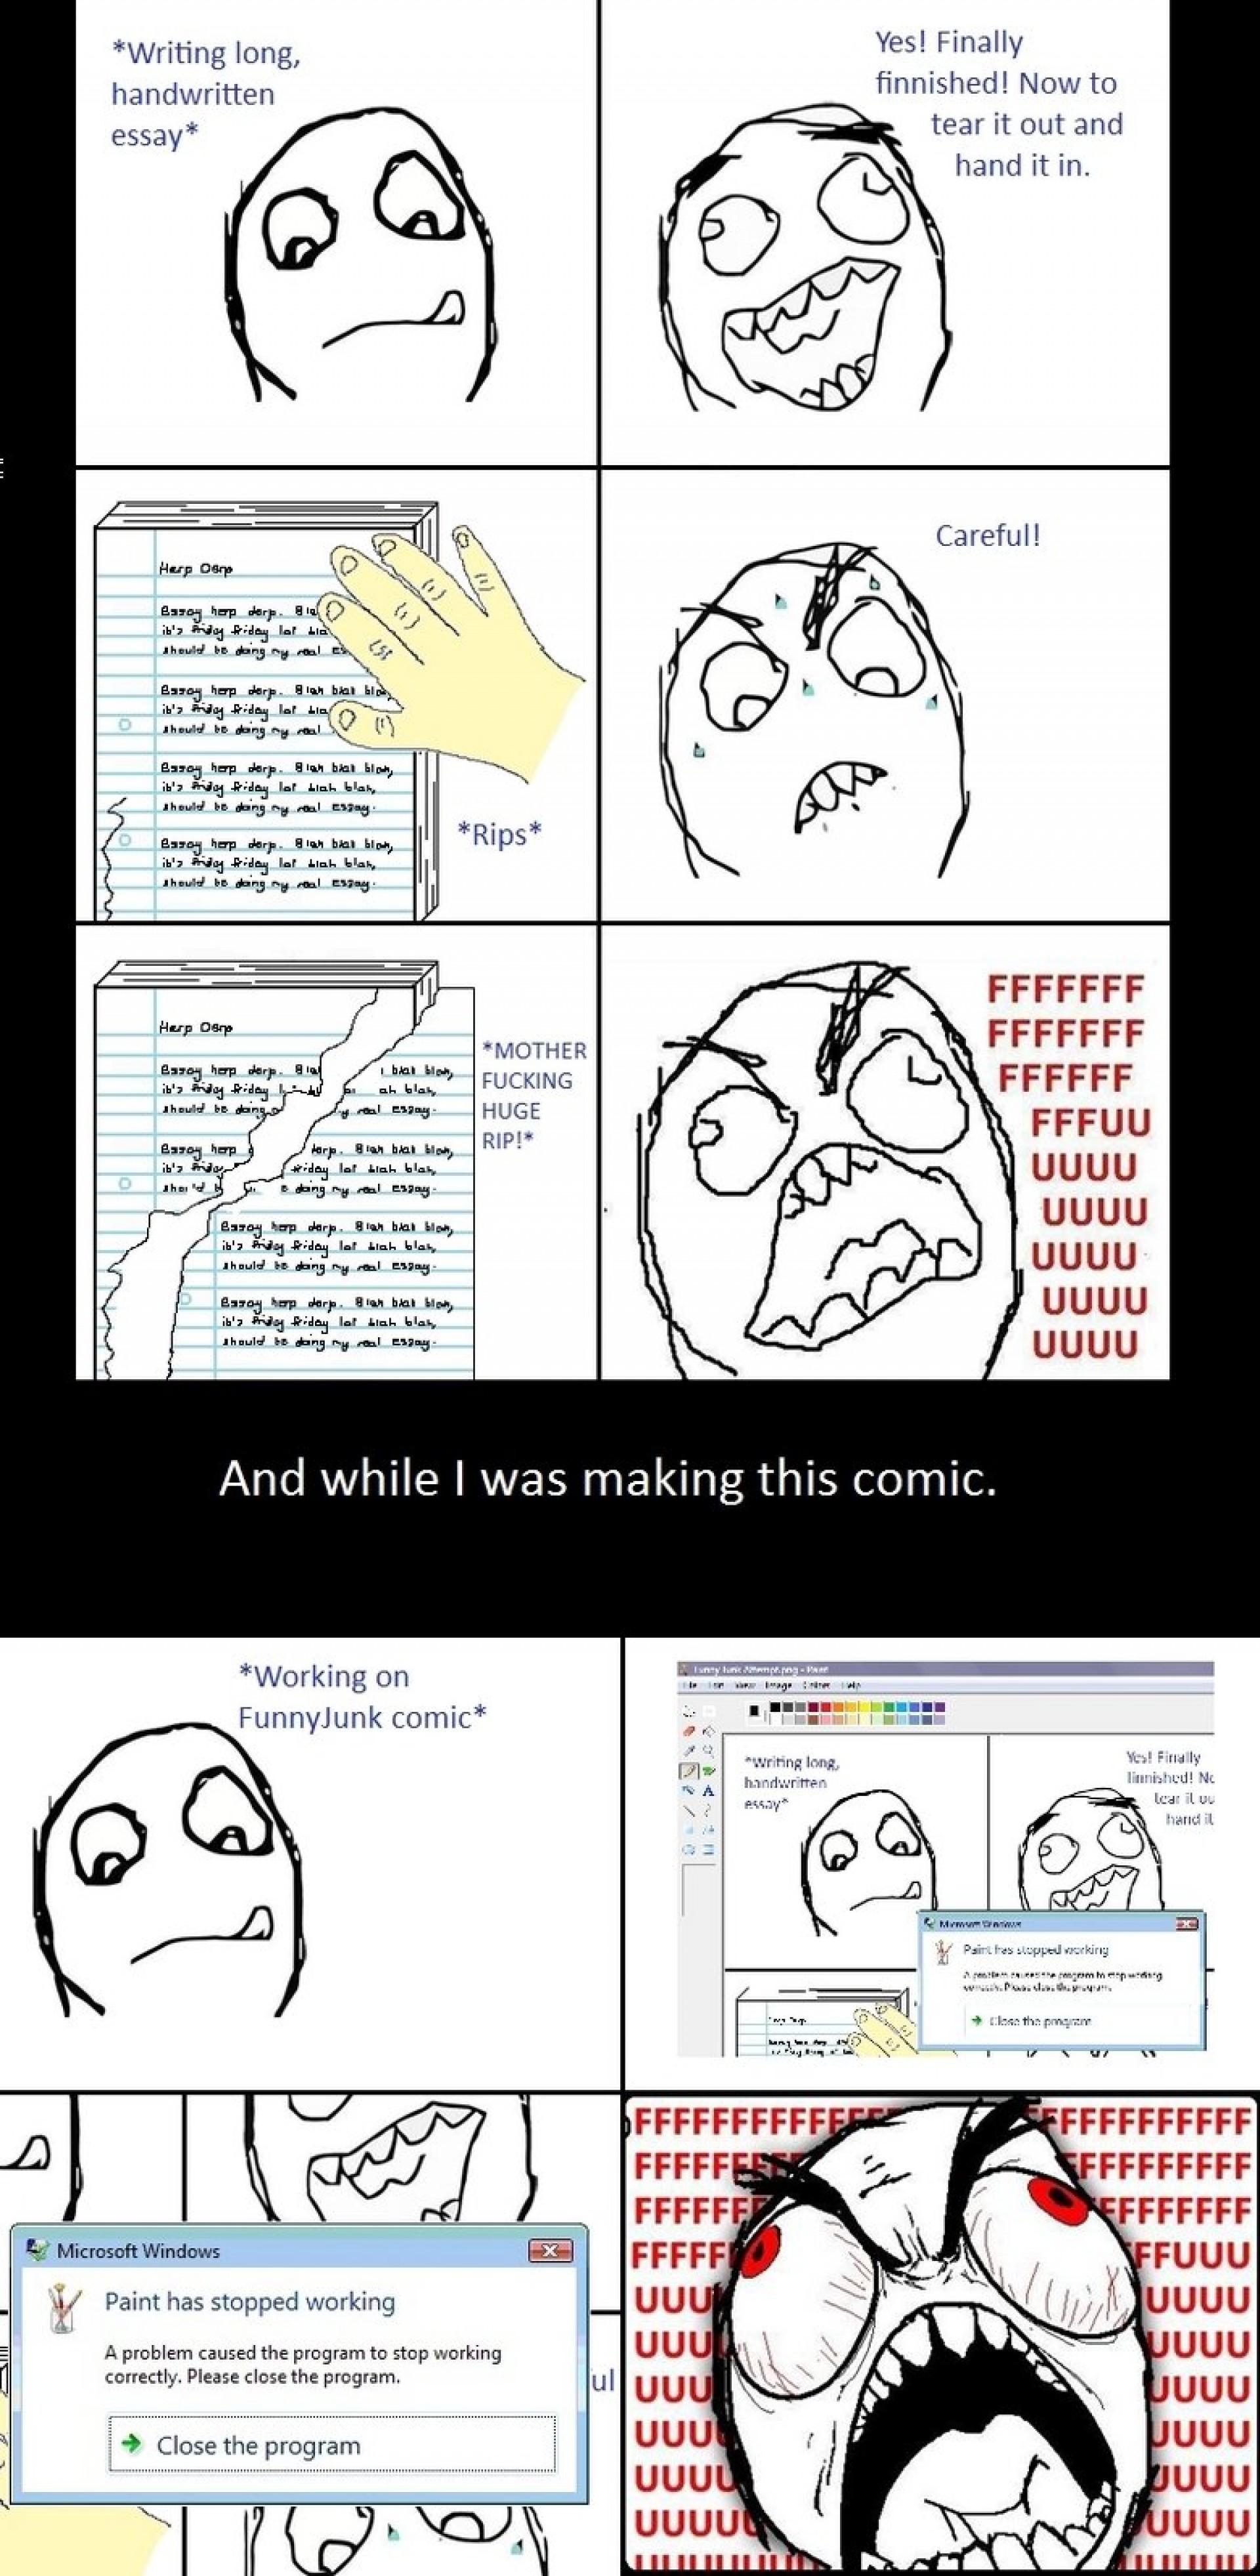 011 Essay Example Funny Pictures Auto Amazing Joke Writer Joker In Hindi Jokes English 1920